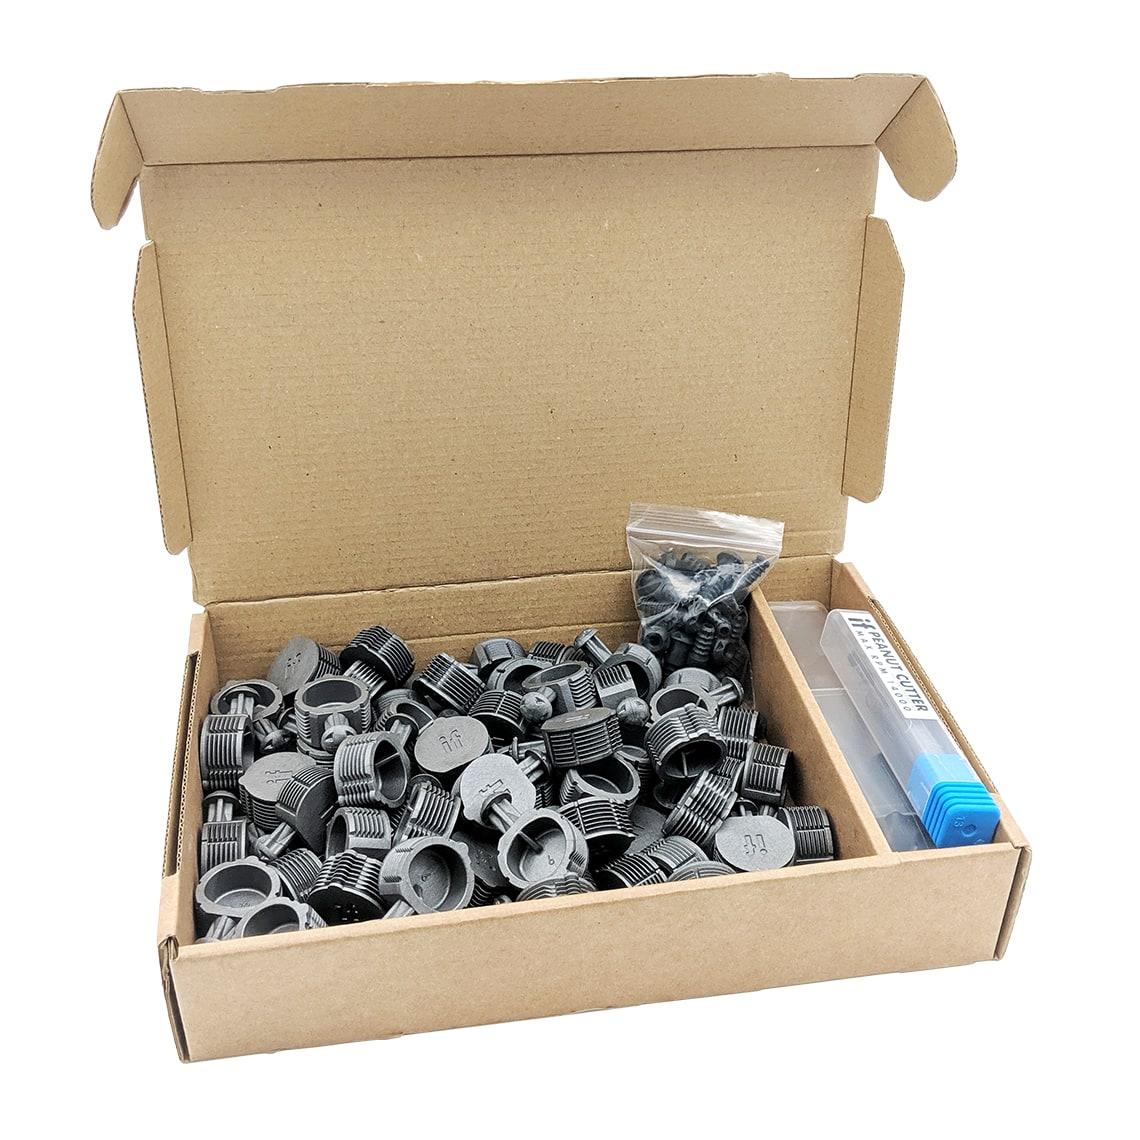 PEANUT_Starter Pack_Box